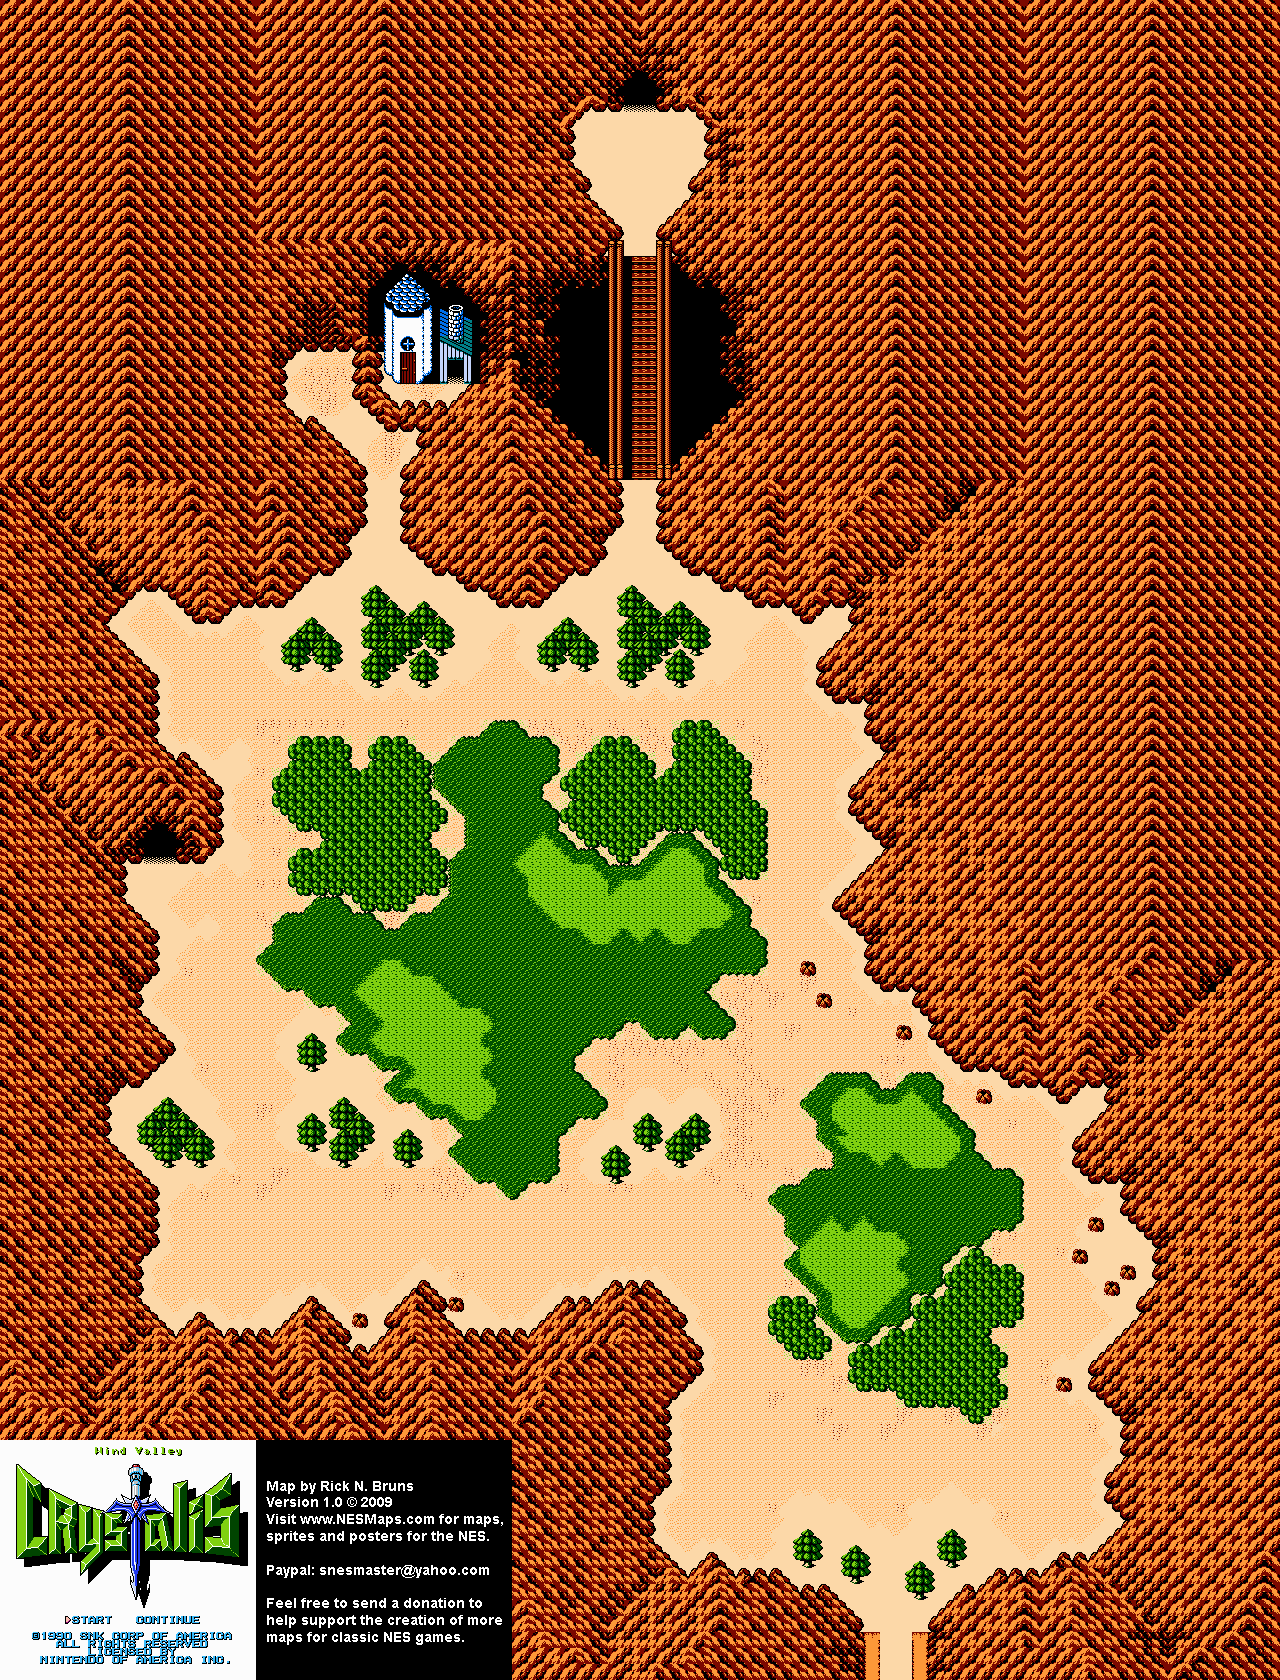 Crystalis - Wind Valley Nintendo NES Map BG